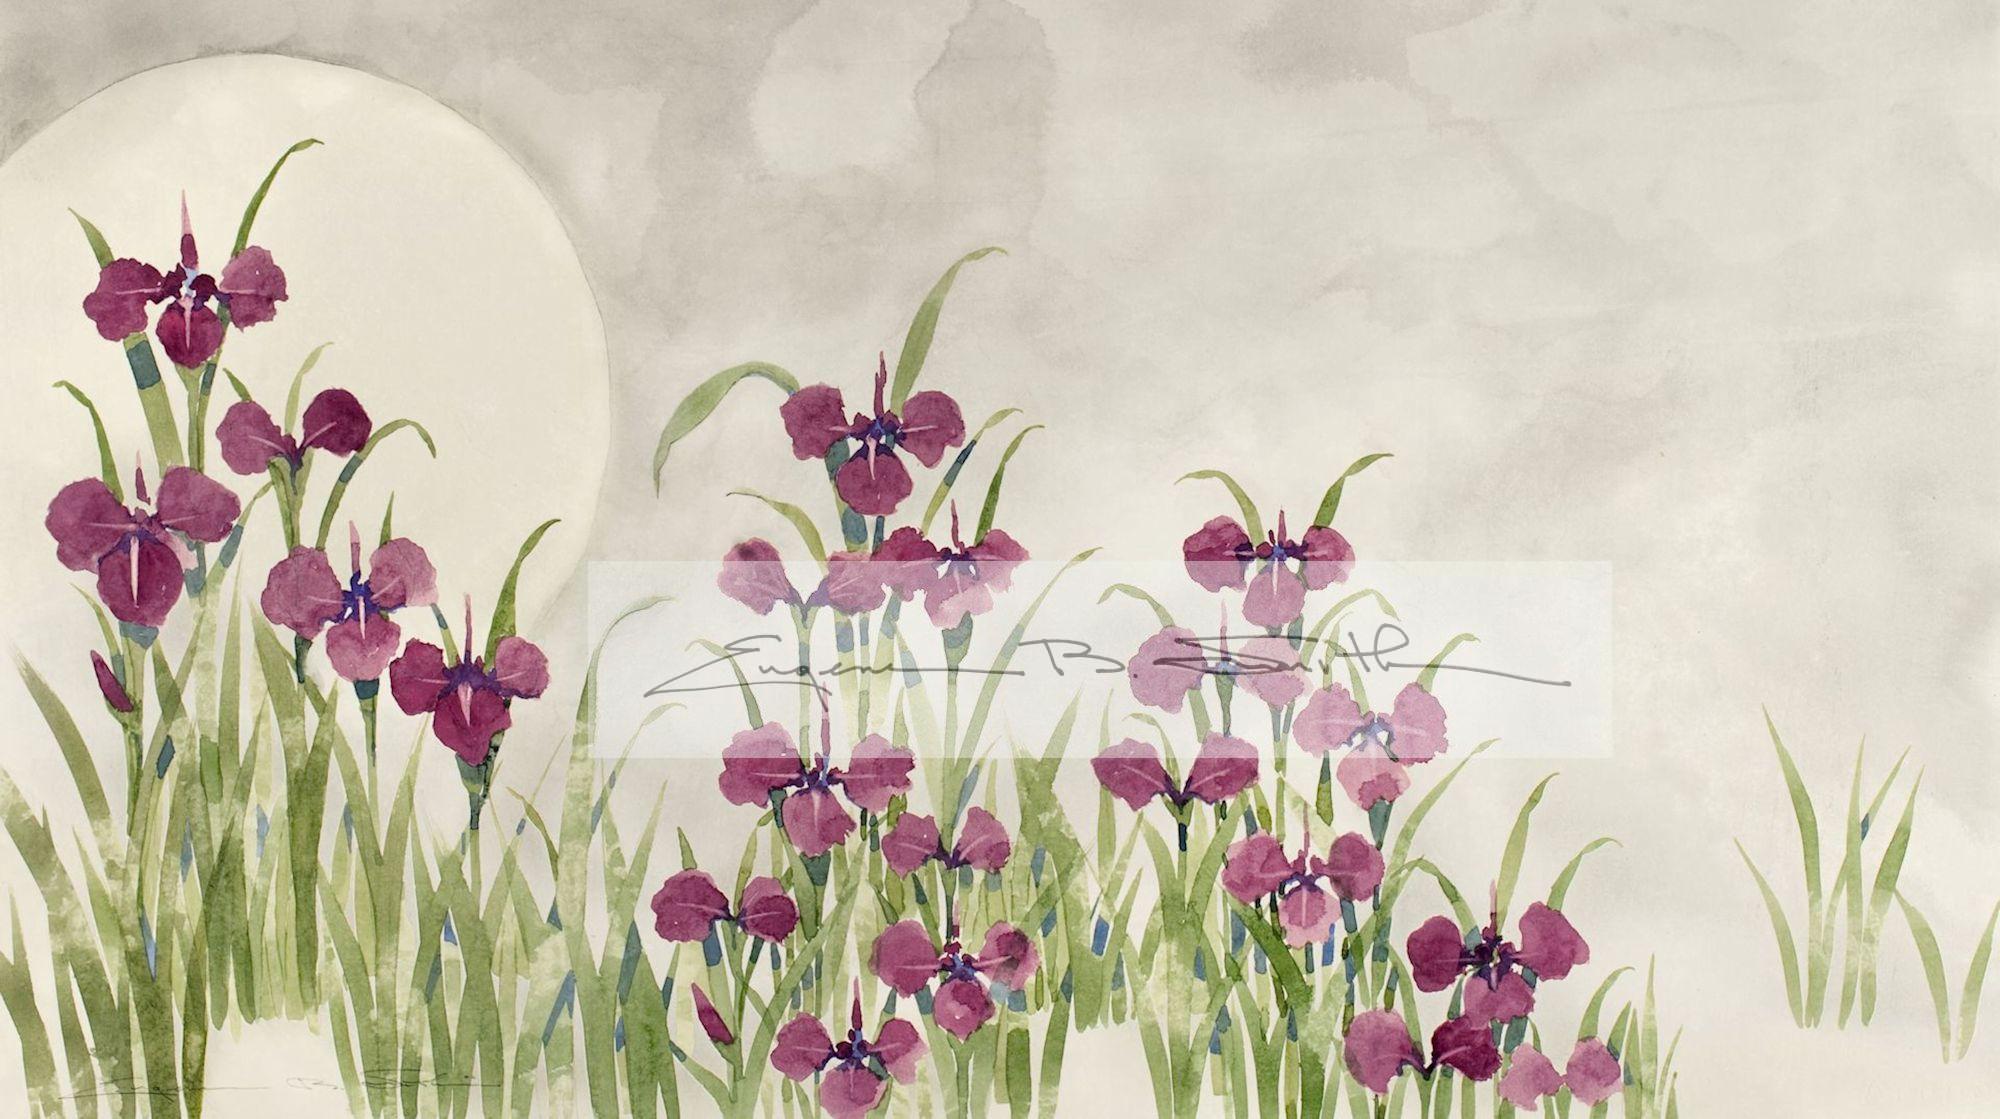 Giclee Print | Image Size: 15 x 27 | $175 | Frame Size: 24 x 36 | Image Size: 11.5 x 20.5 | $130 | Frame Size: 19.5 x 28 | Gallery Wrap Canvas | Image Size: 24 x 43 | $515